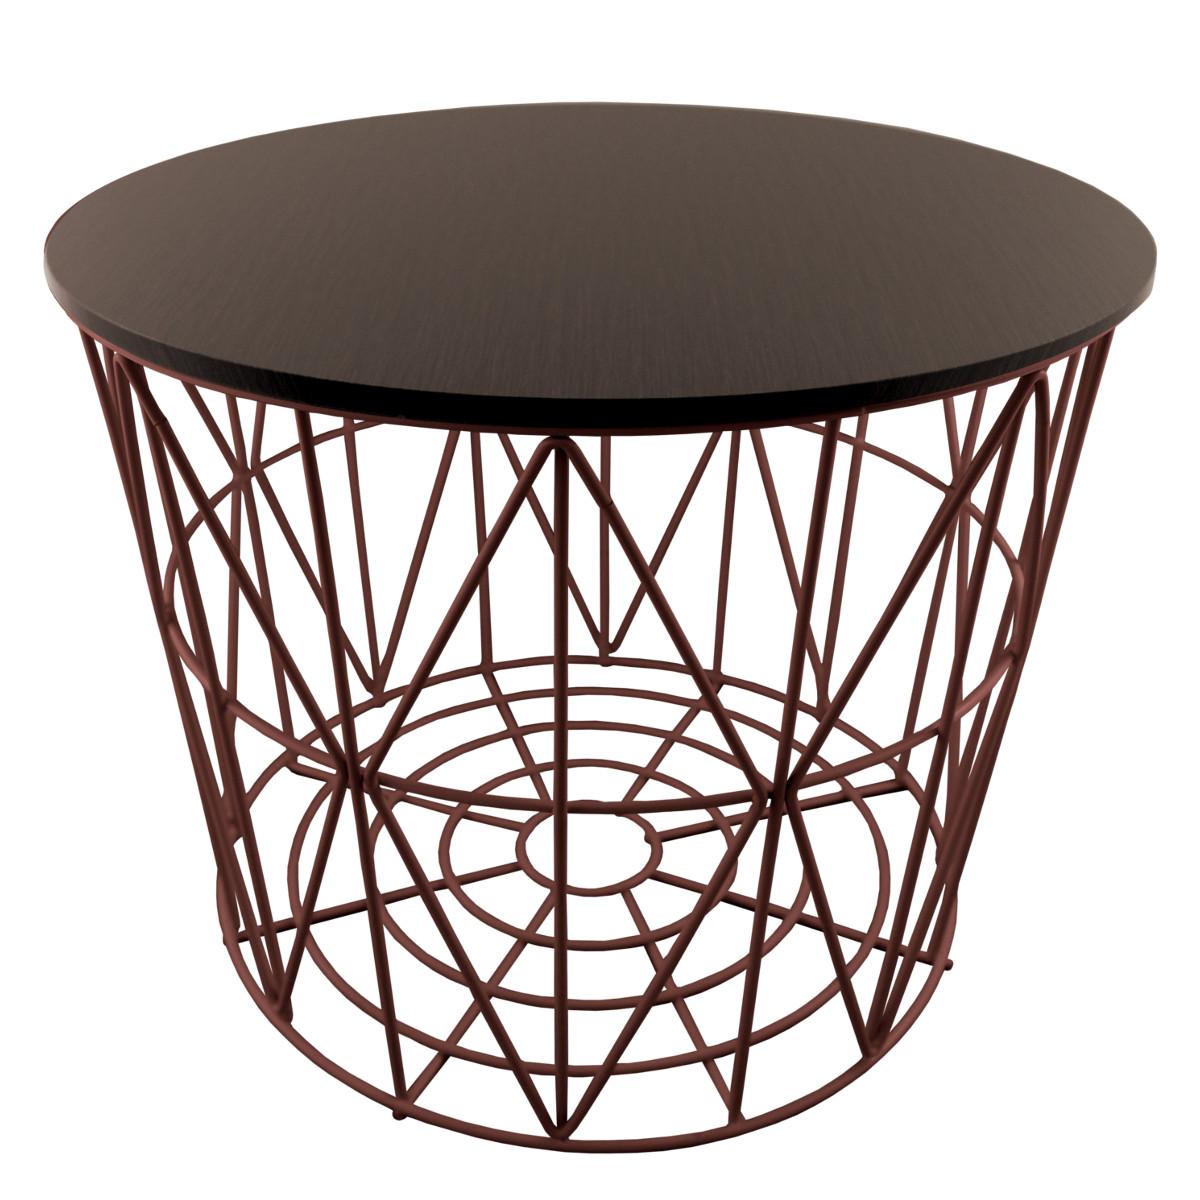 PrimoLiving Design Drahtkörbe in 4 Größen Drahtkorb Tisch Korb mit ...